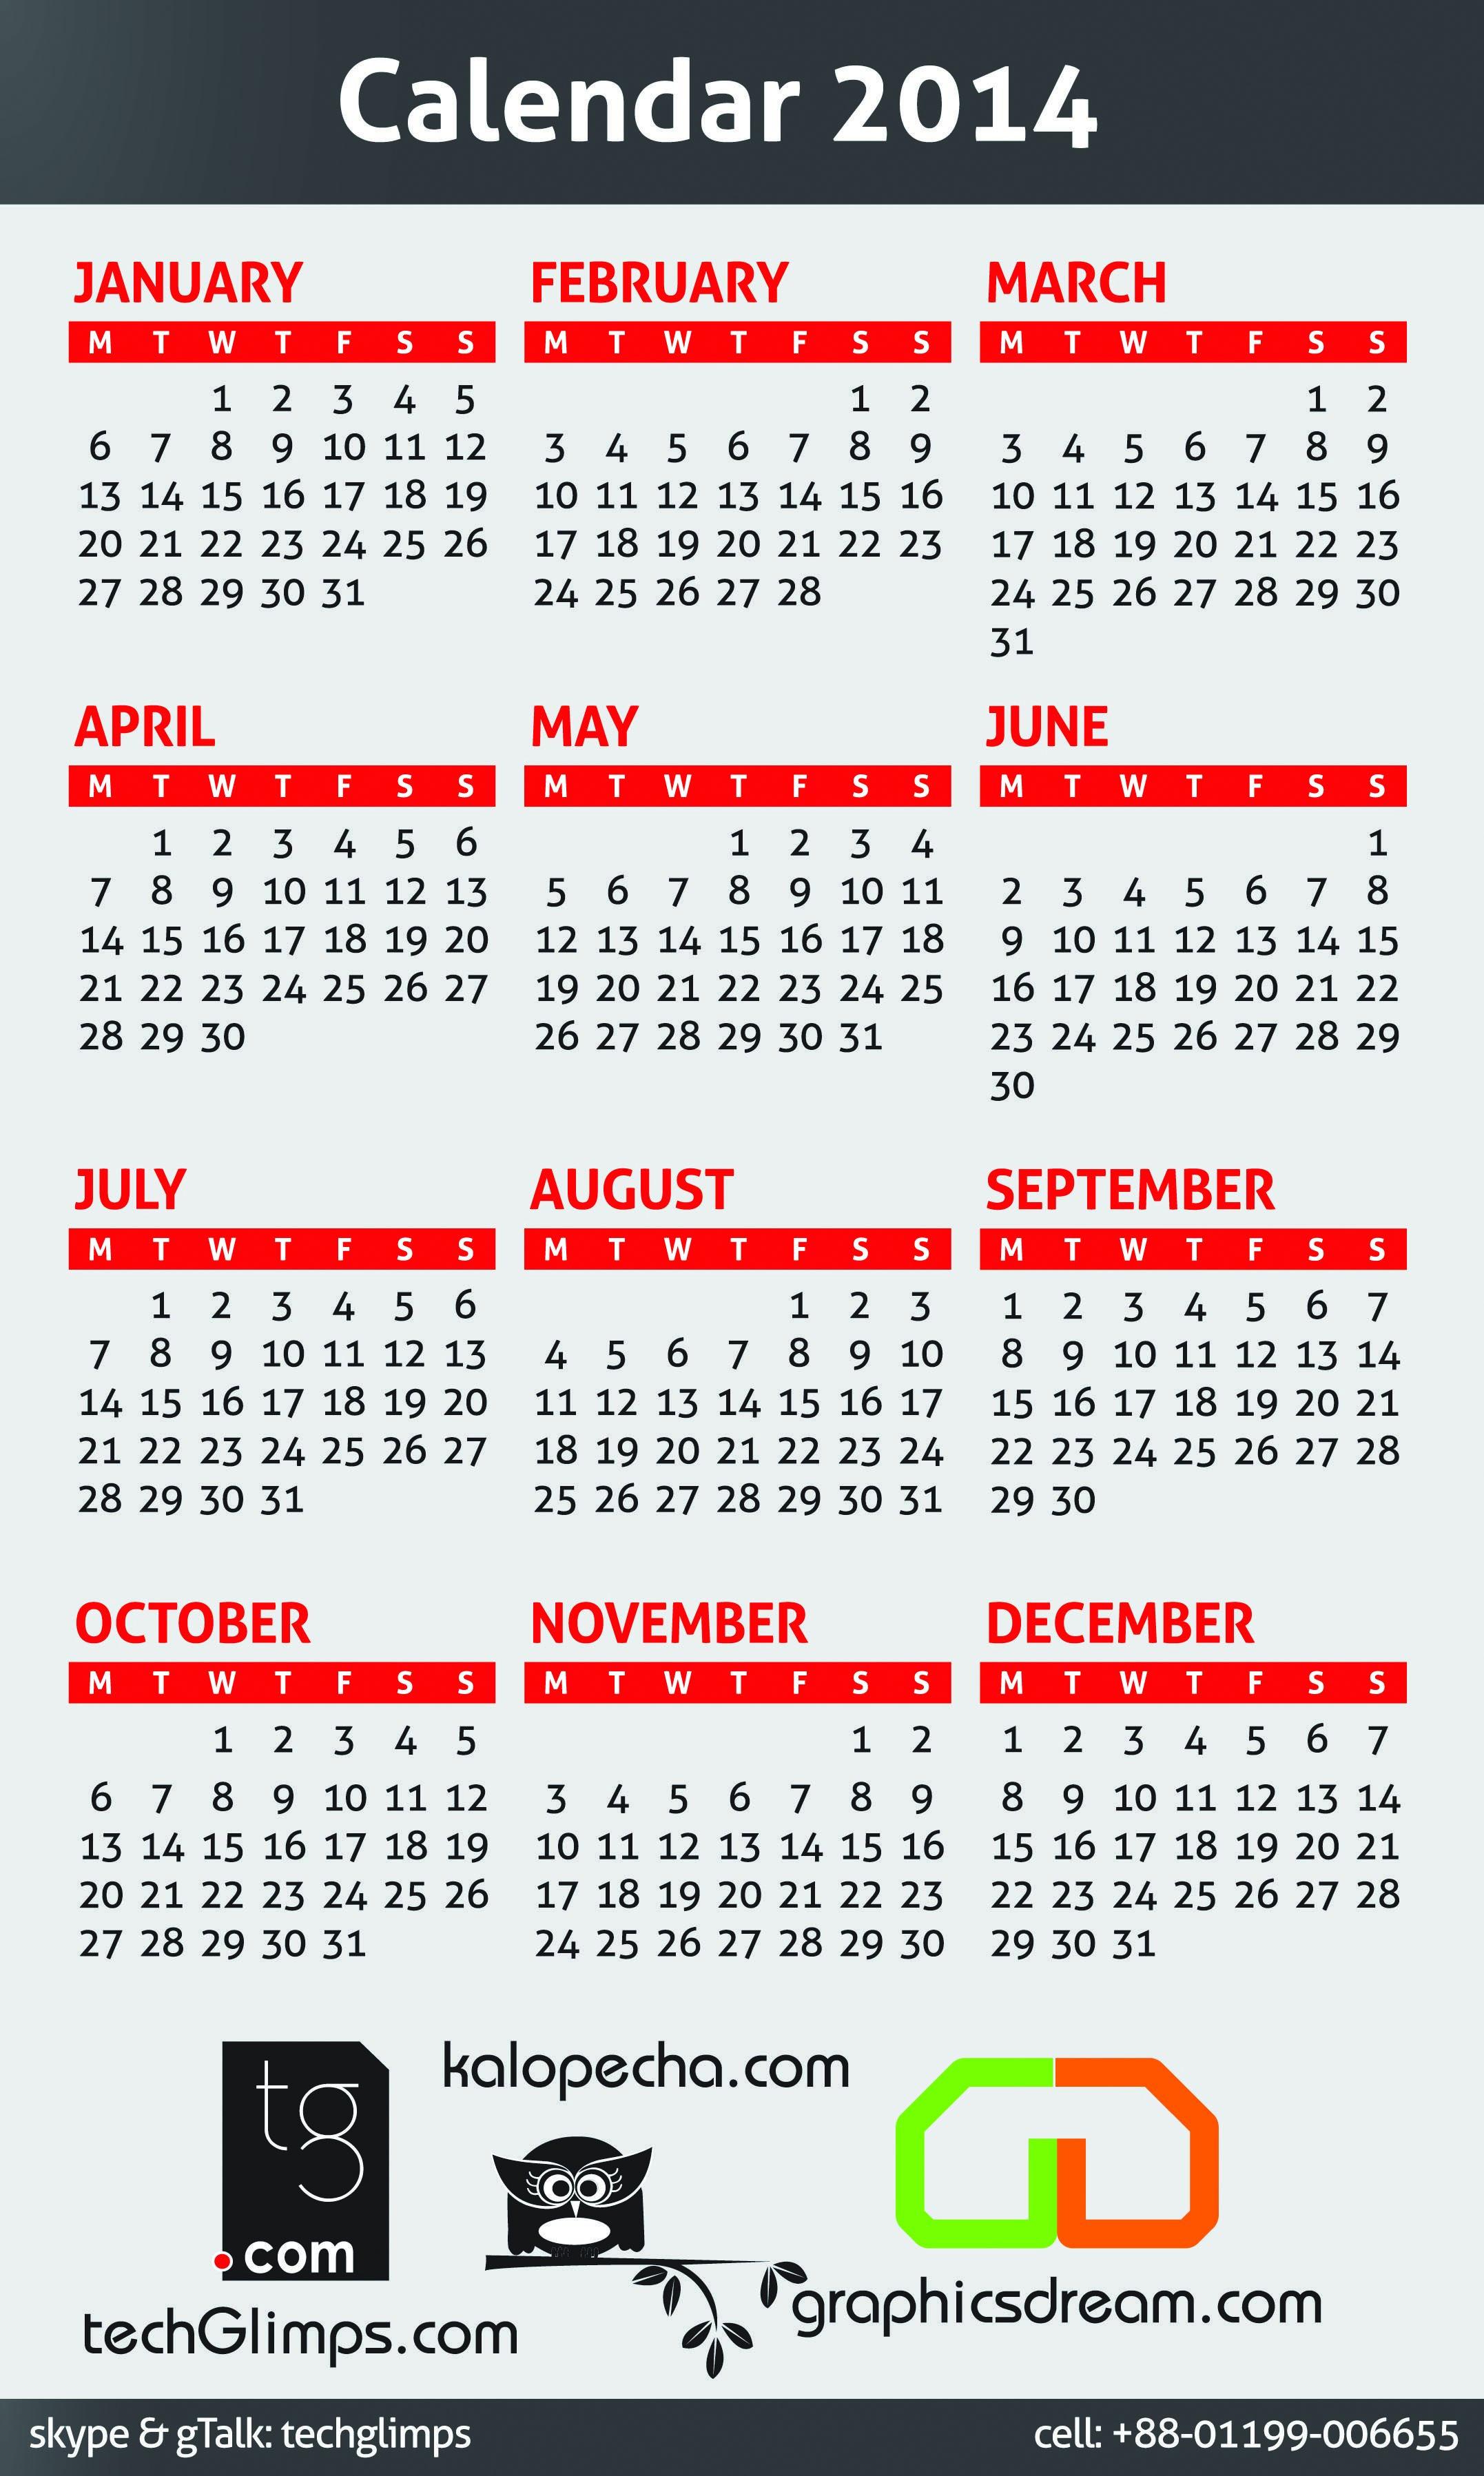 22inch X 36 inch PVC Calendar Design Adobe Illustrator CS 5 & Photoshop 7